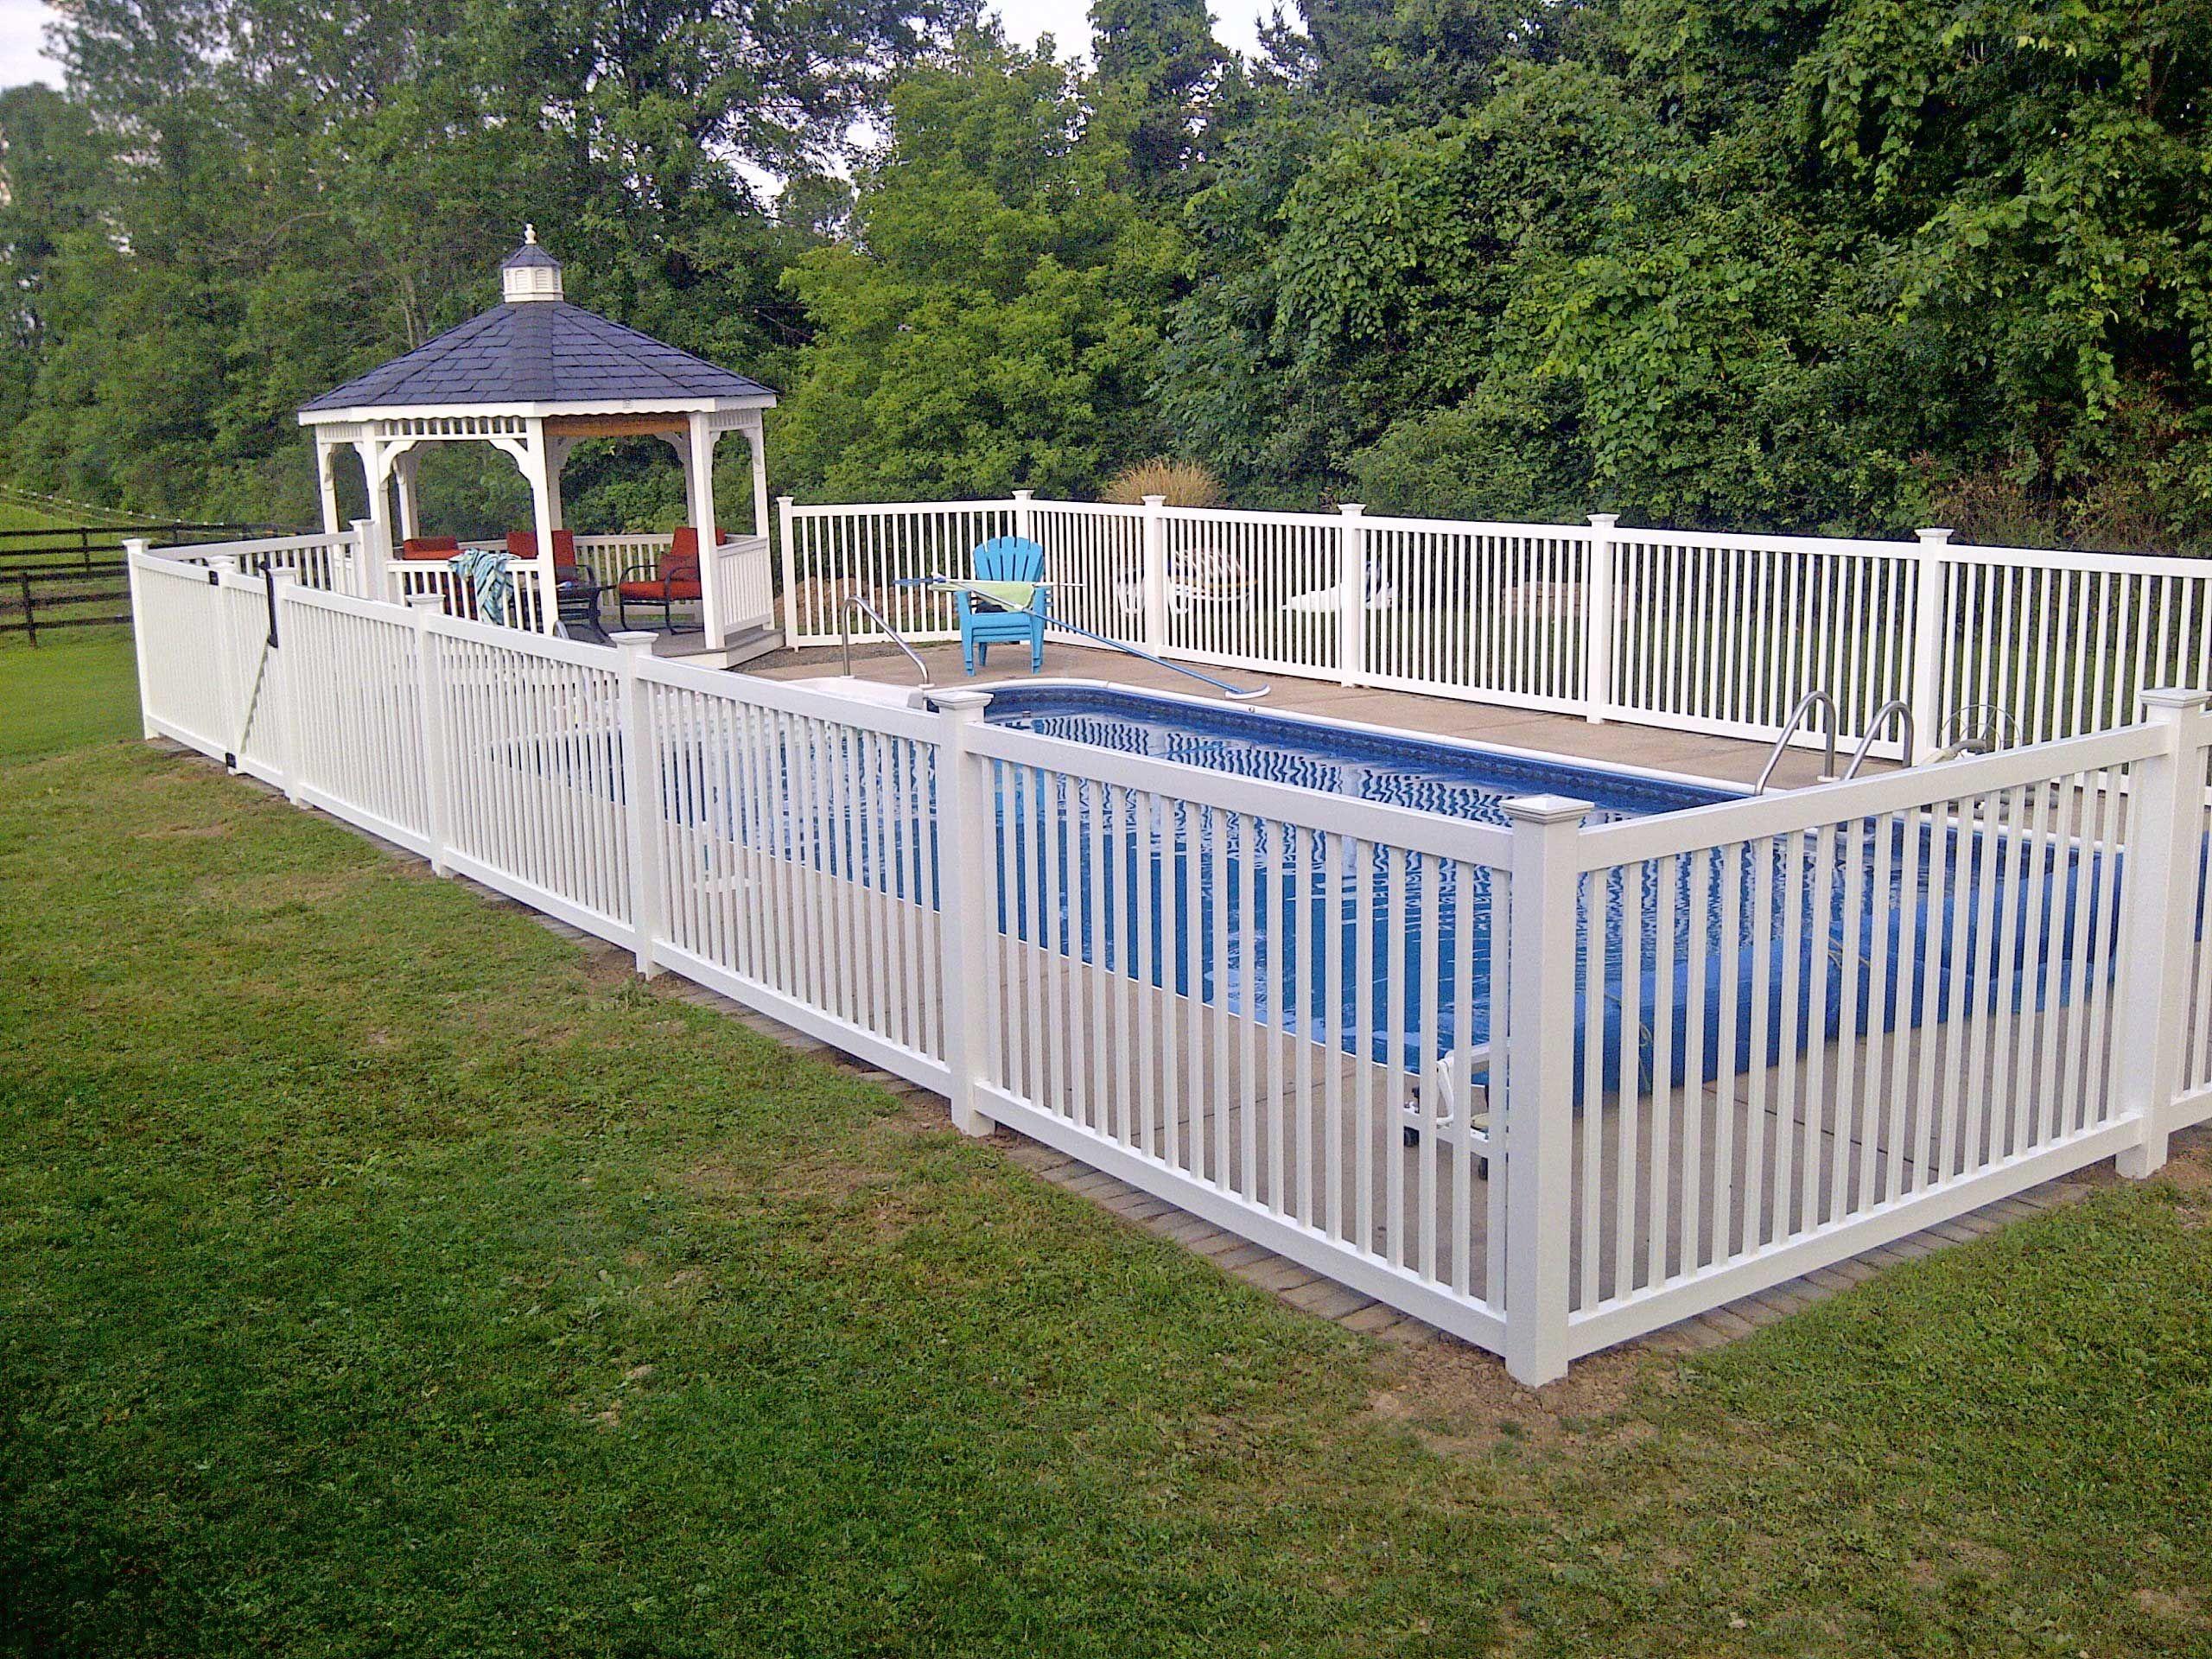 Vinyl Cayuga Yard Fence Installed Around An Inground Pool In